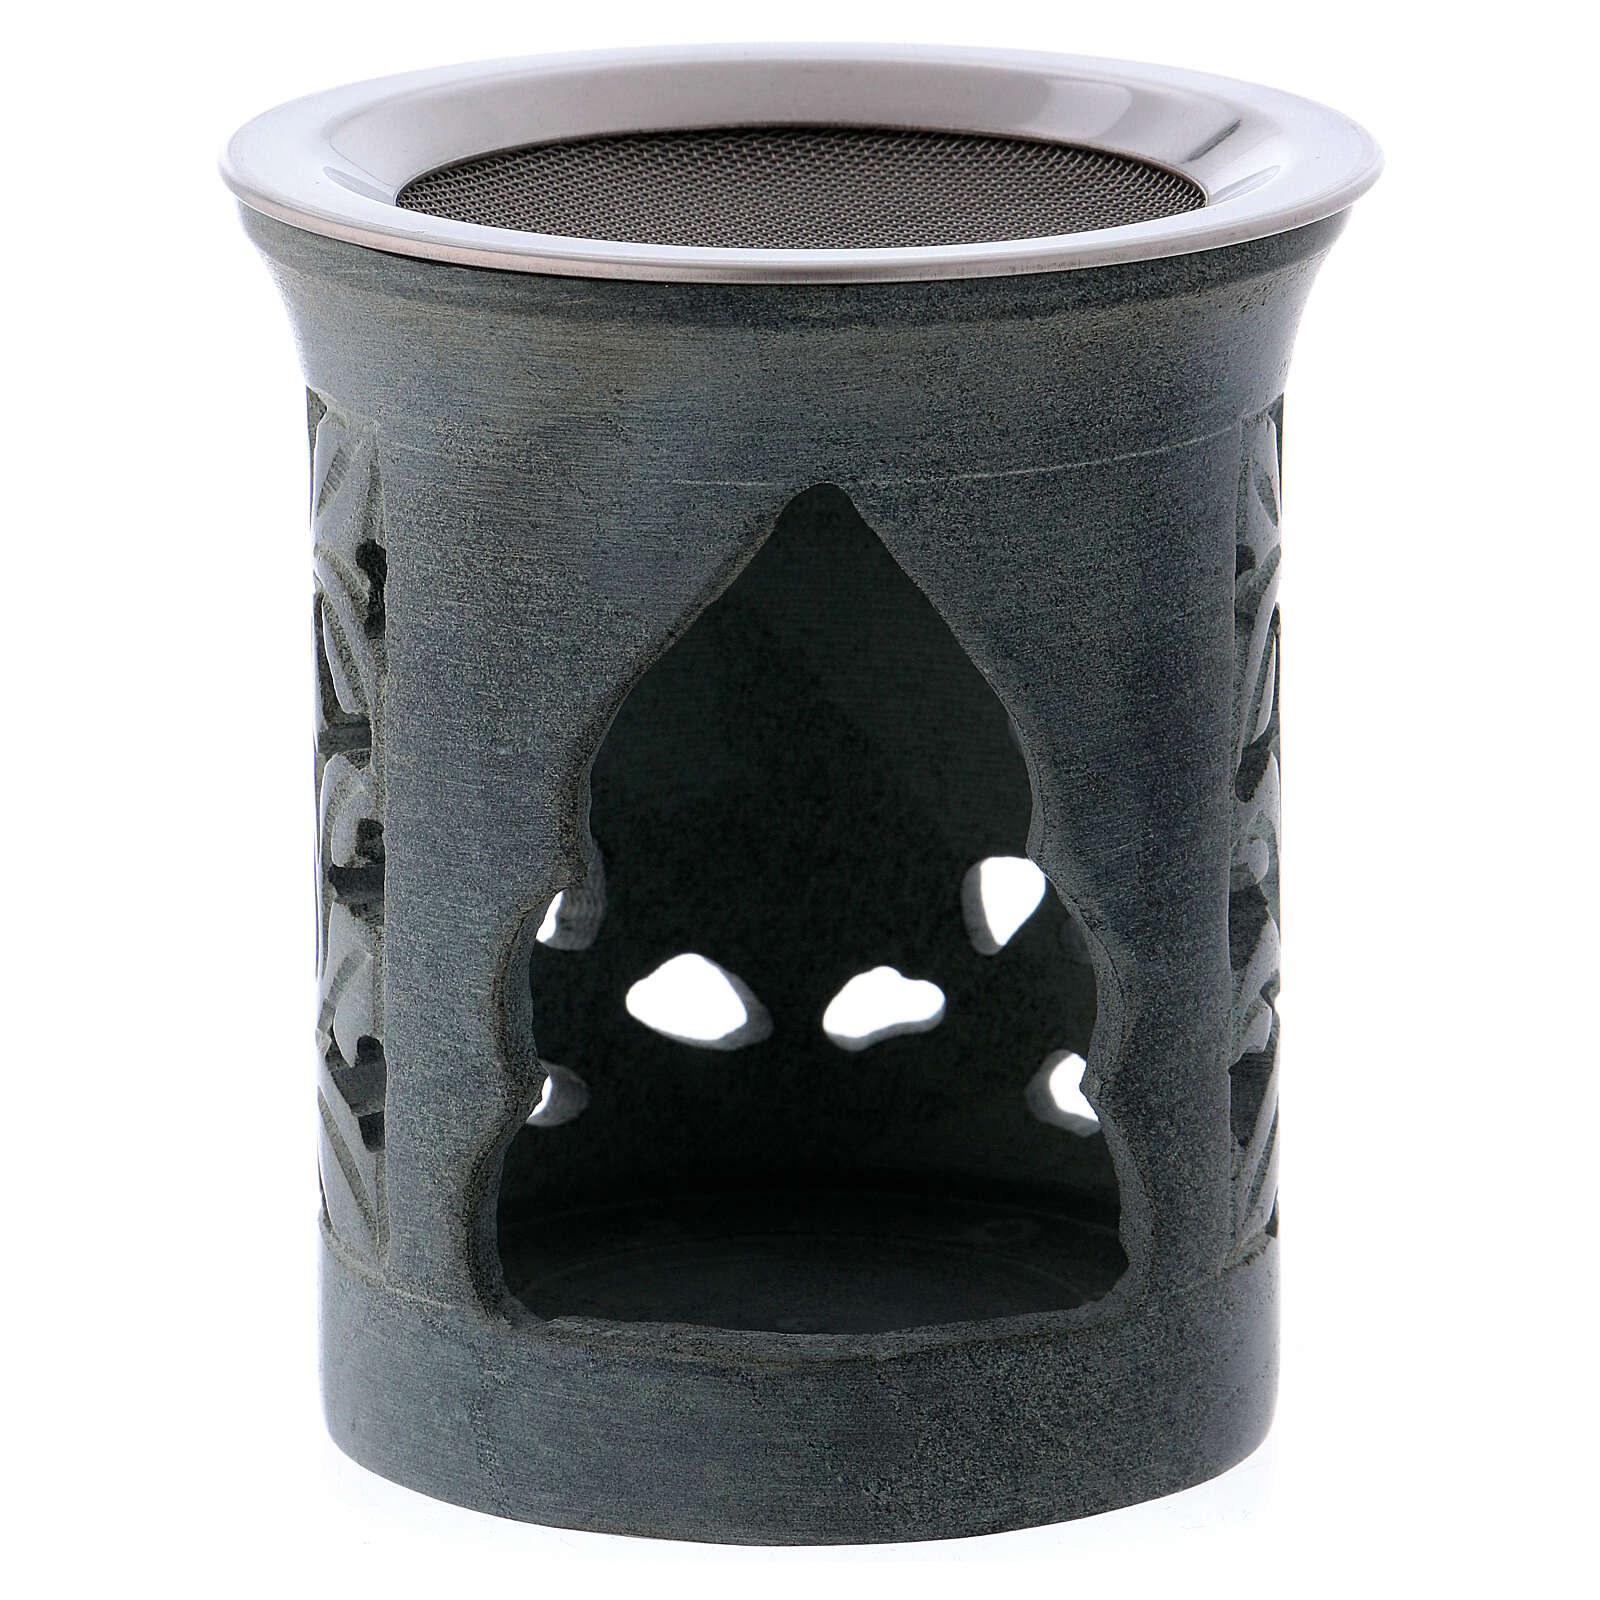 Incense burner in anthracite-colored soapstone 3